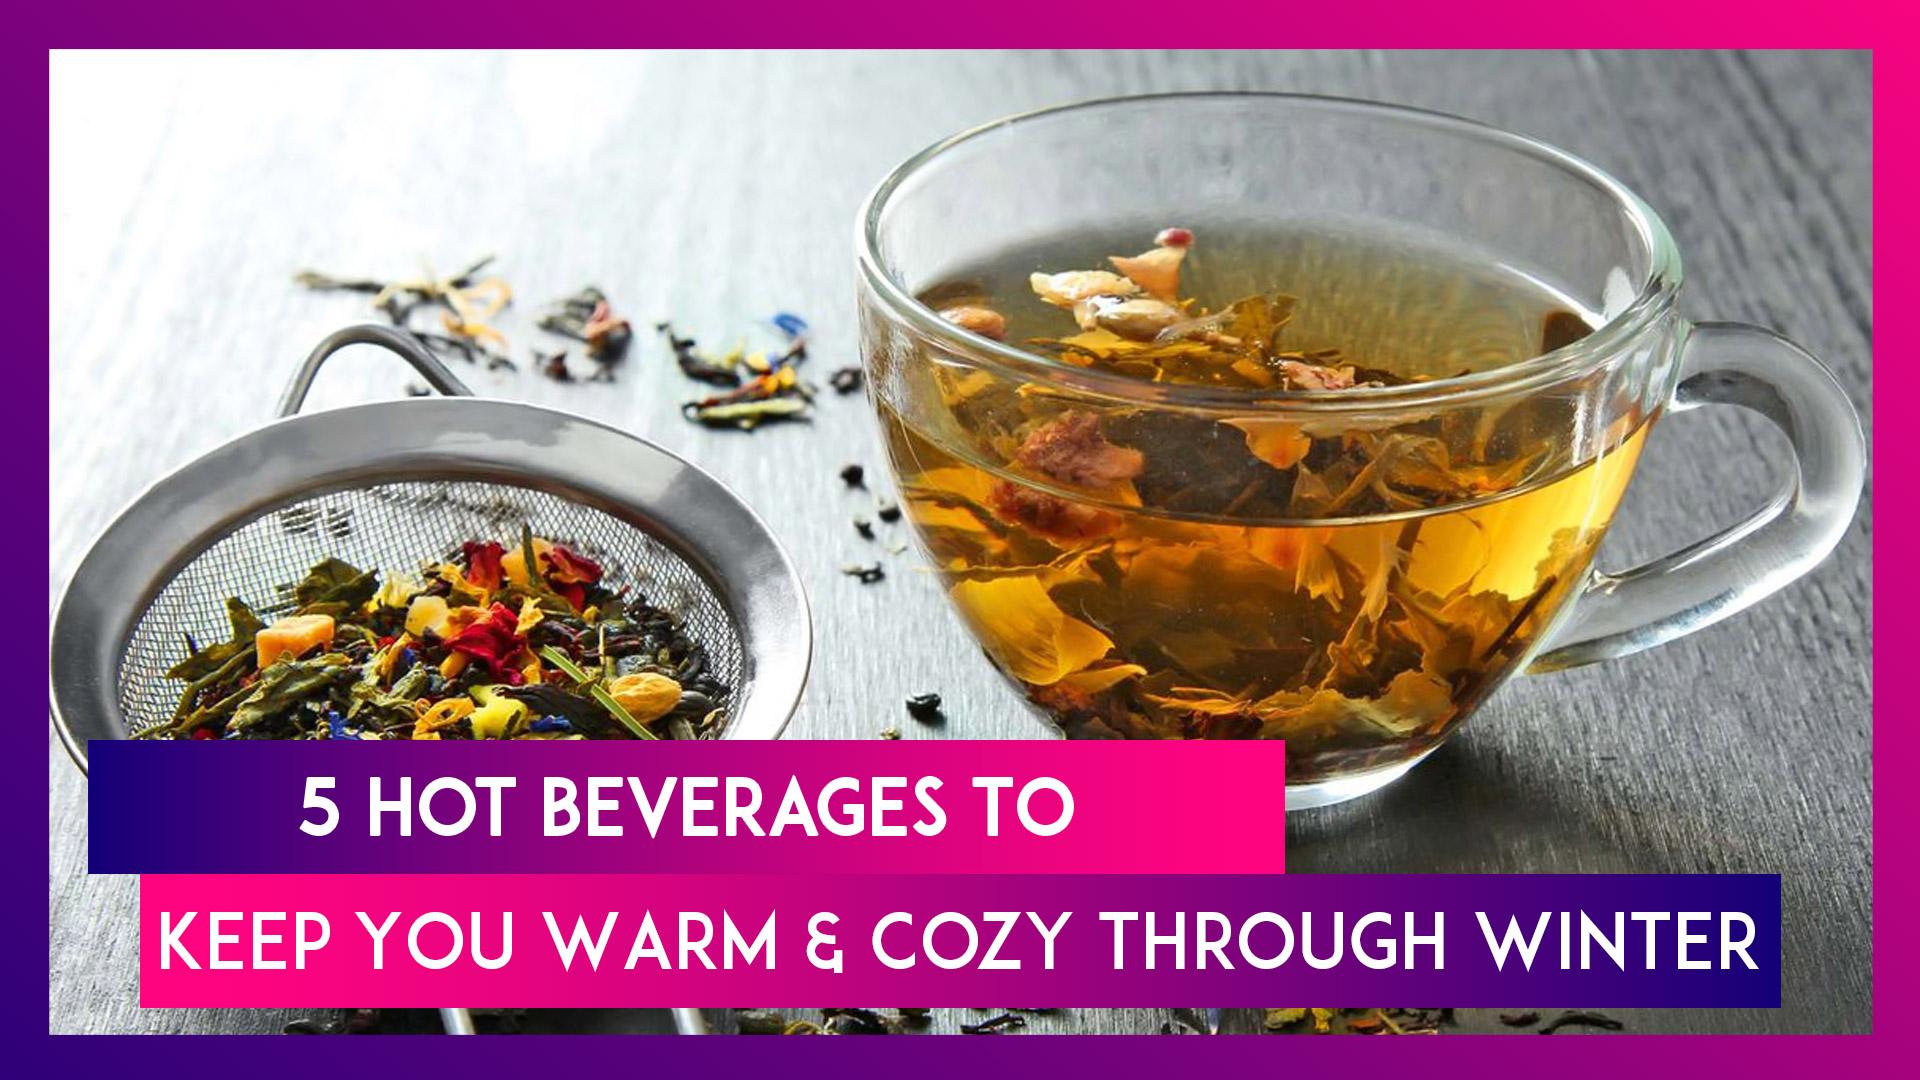 Turmeric Milk, Herbal Tea and More: 5 Healthy Drinks For Winter